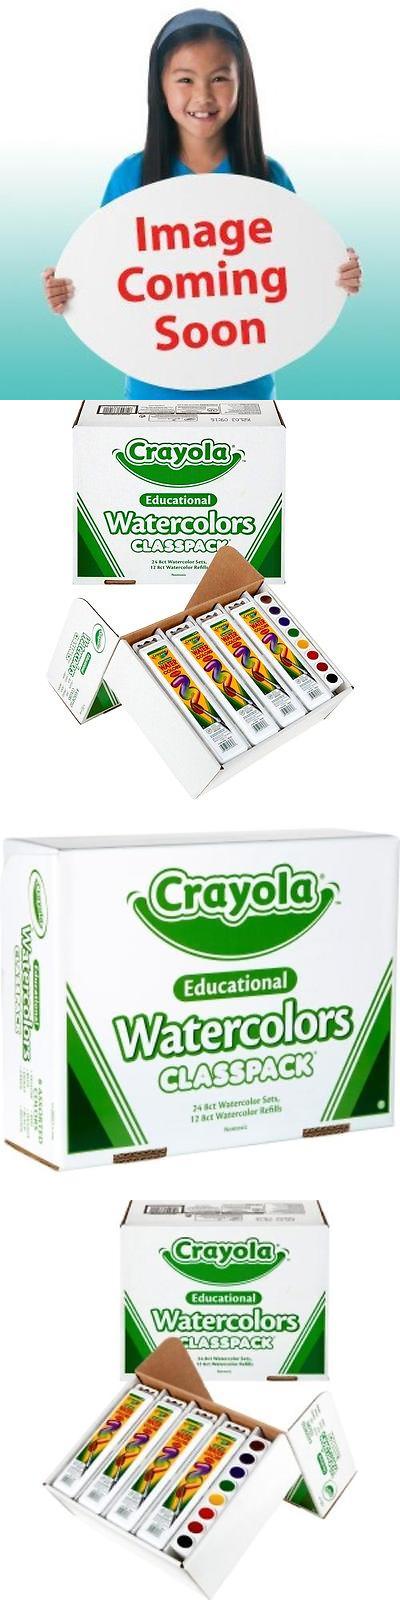 Paint Sets 134569 Crayola Educational Watercolors Classpack 36